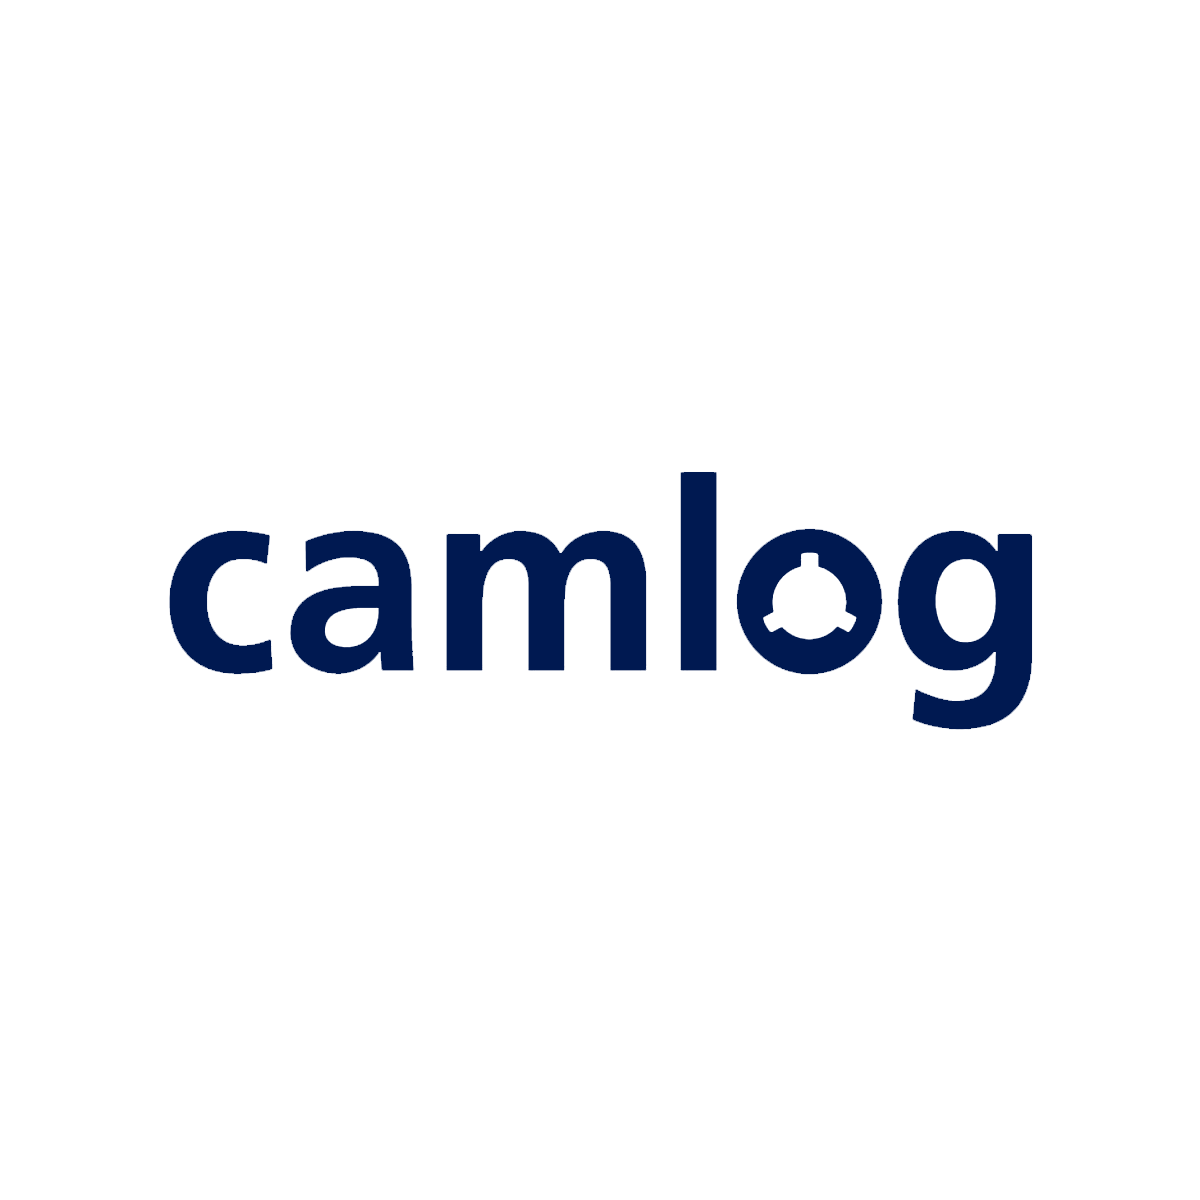 CAMLOG Vertriebs GmbH